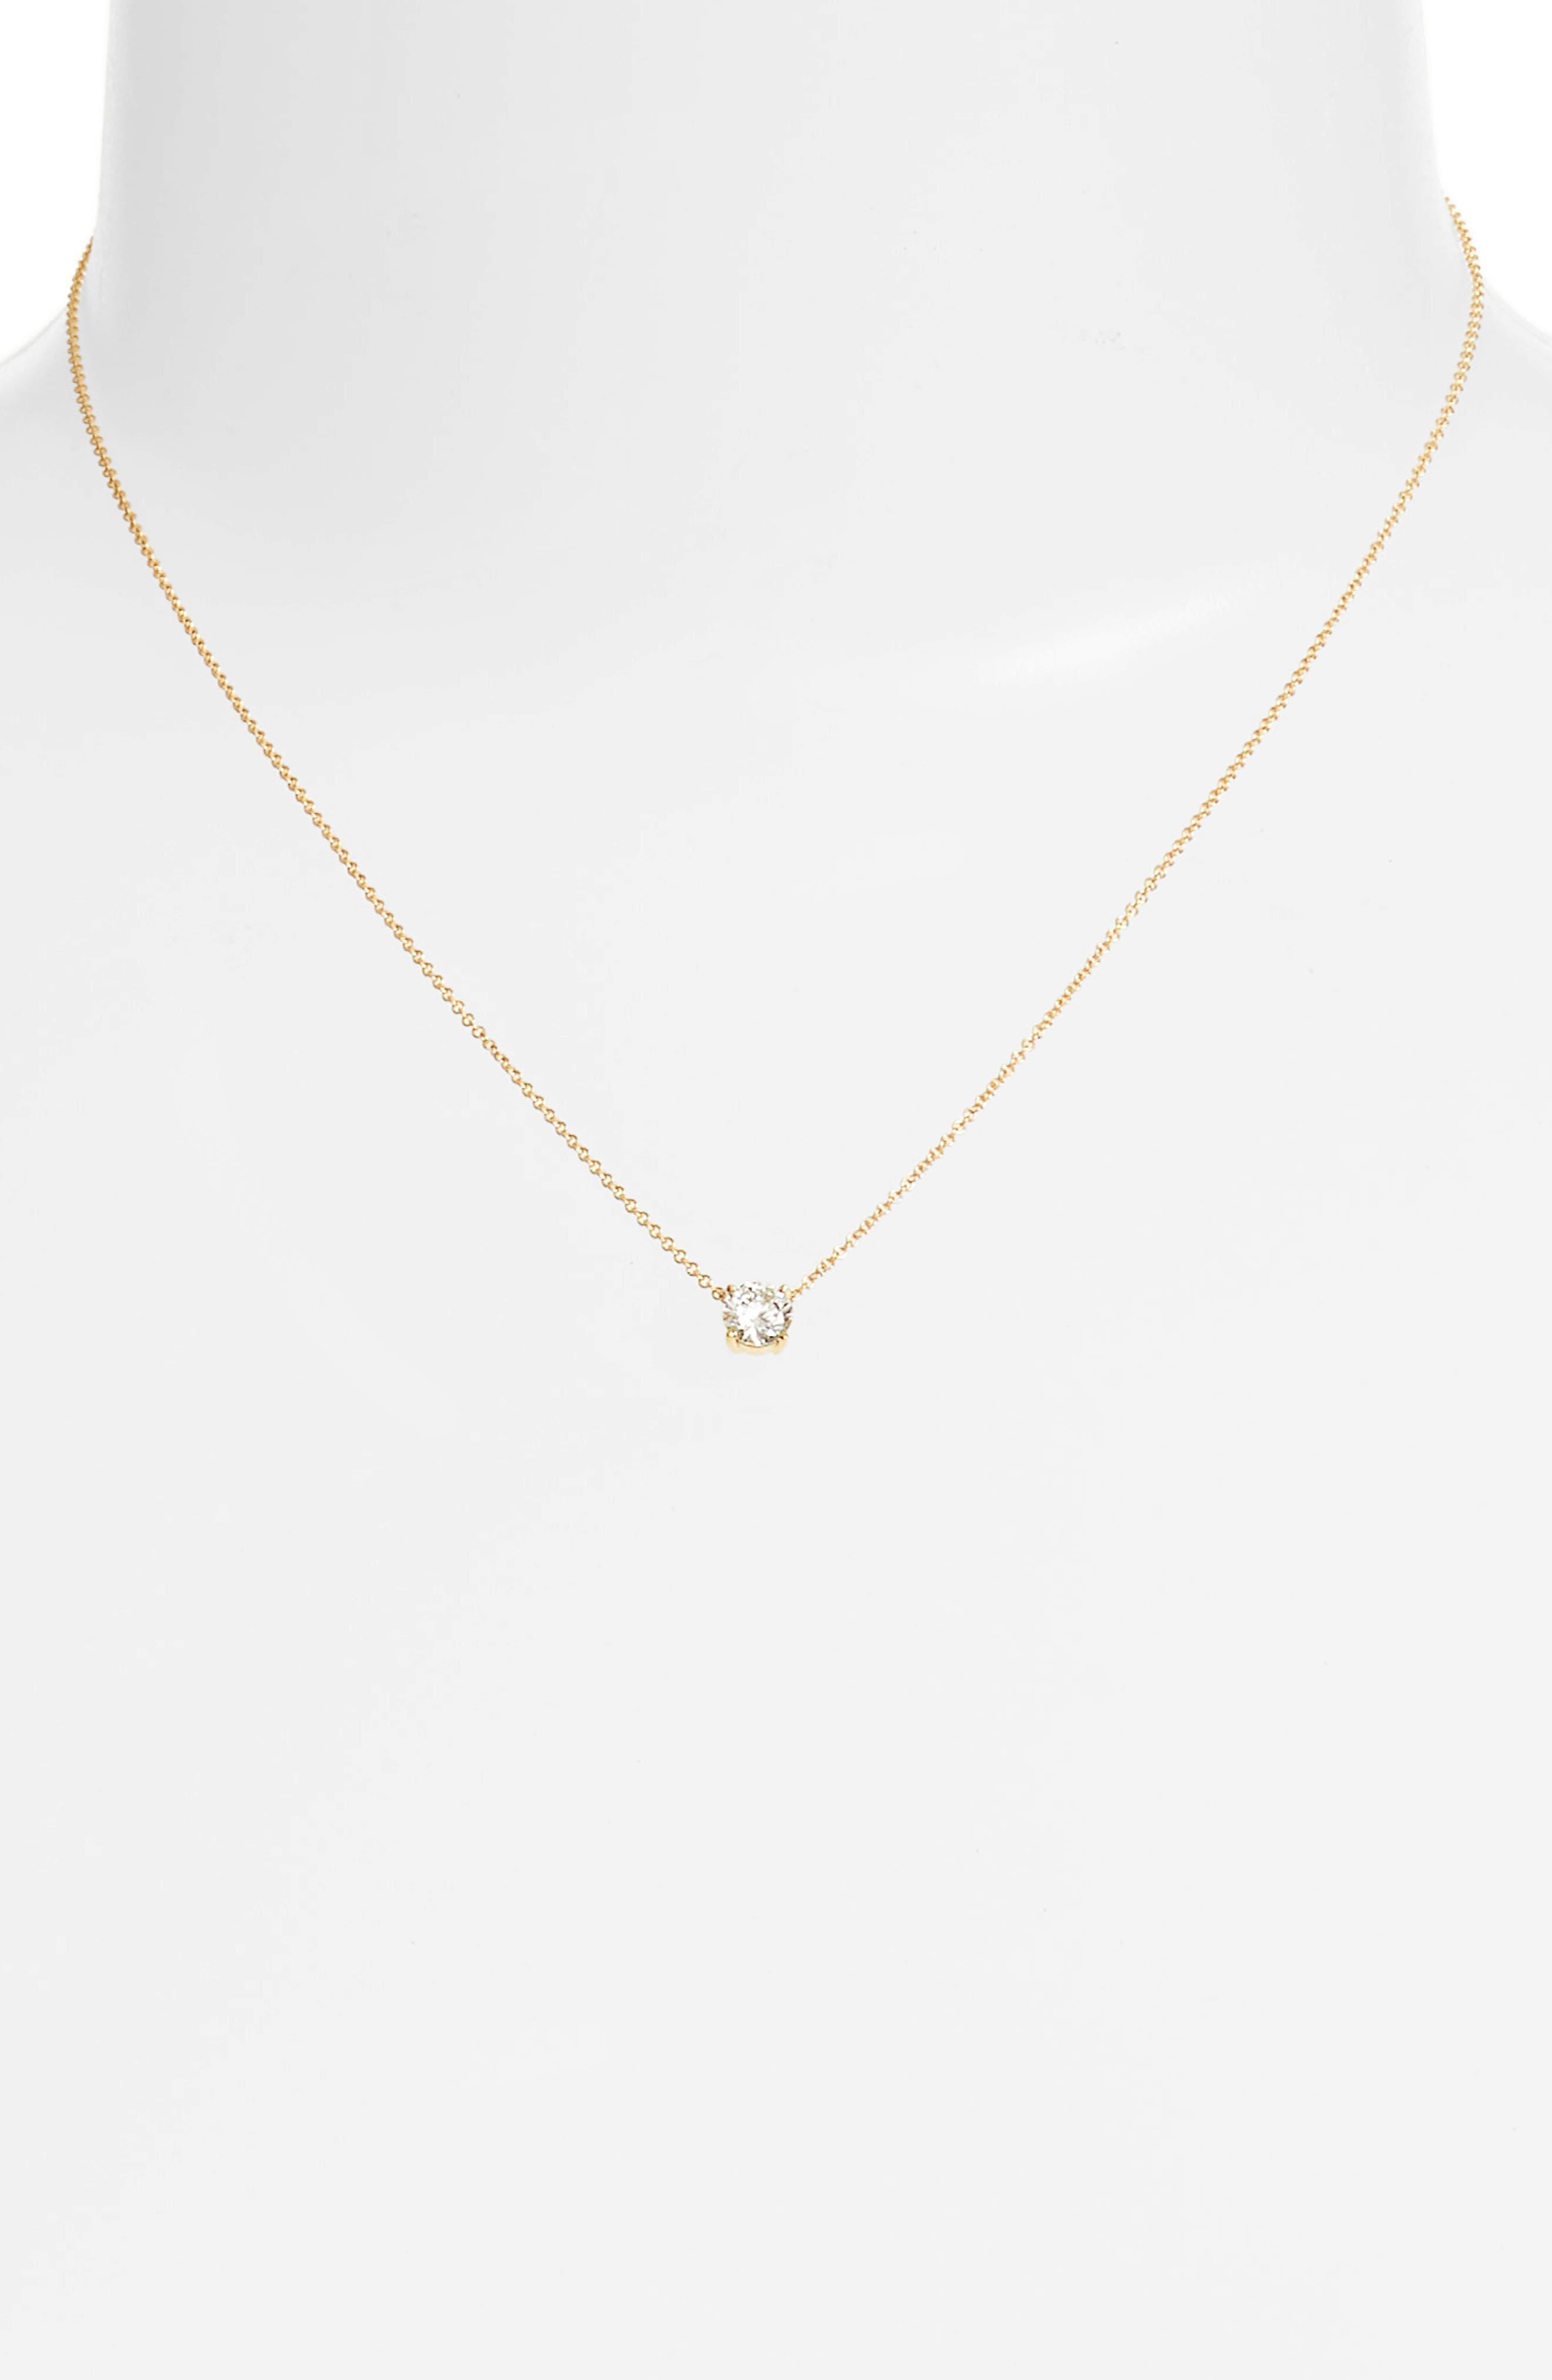 BONY LEVY, Liora Large Solitaire Diamond Pendant, Alternate thumbnail 2, color, YELLOW GOLD